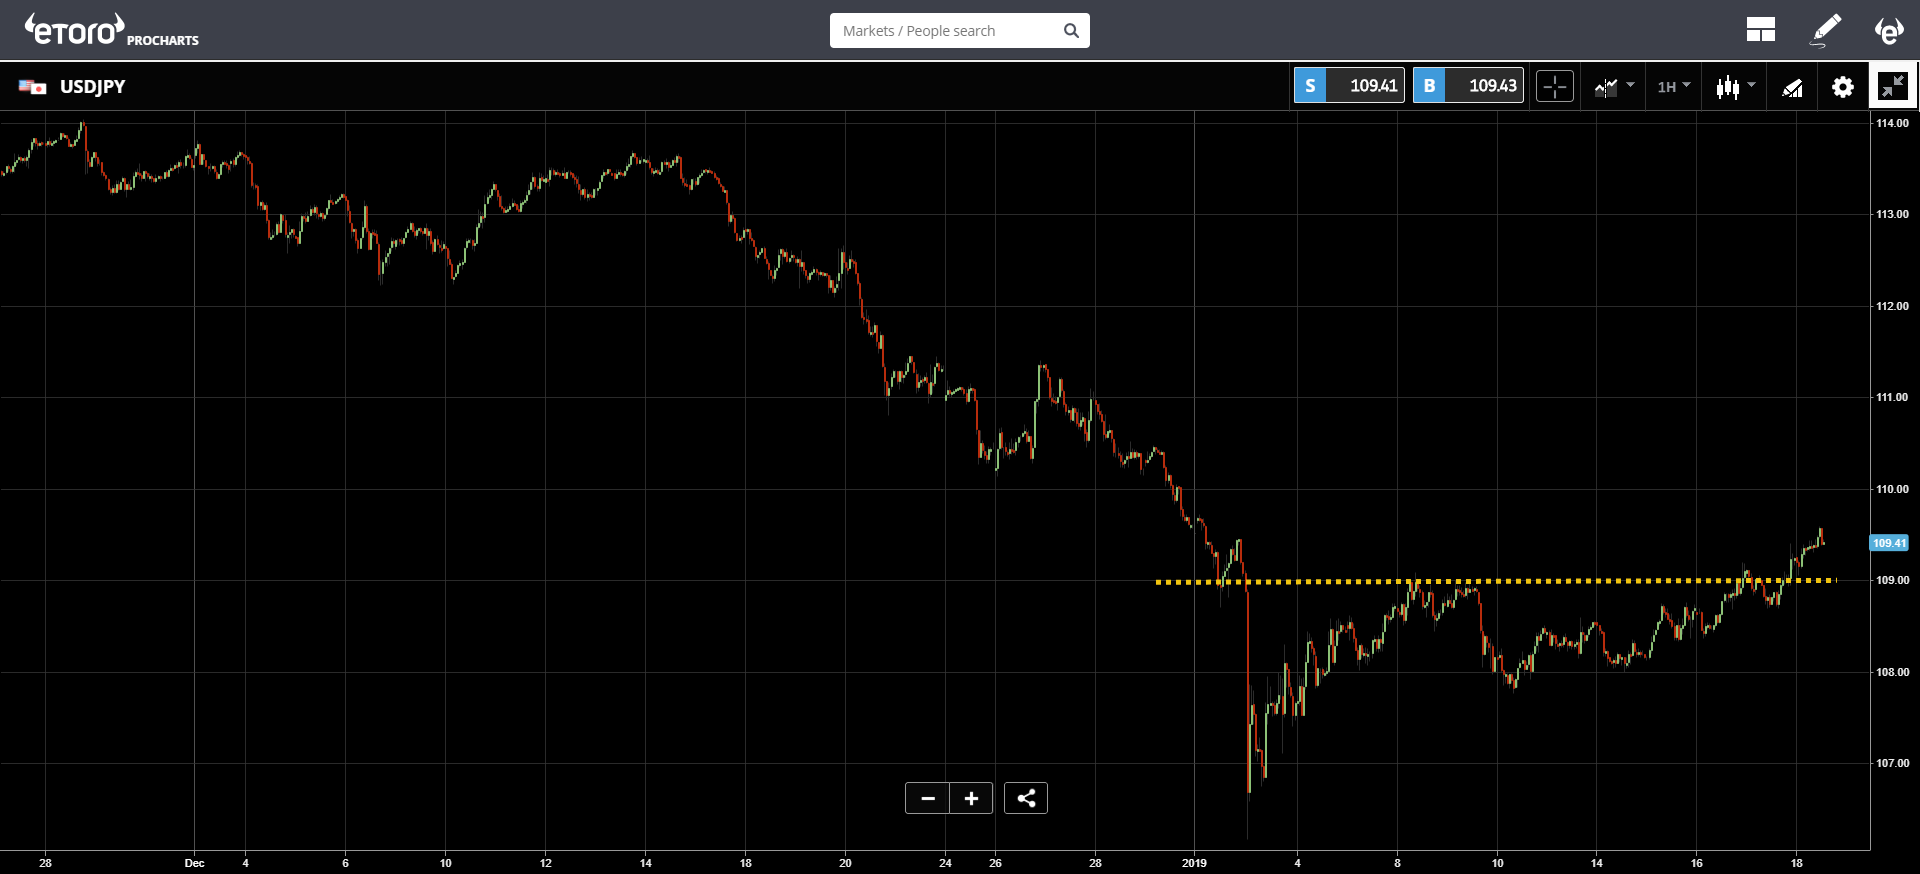 crypto, blockchain, bitcoin, ethereum, market, trading, dollar